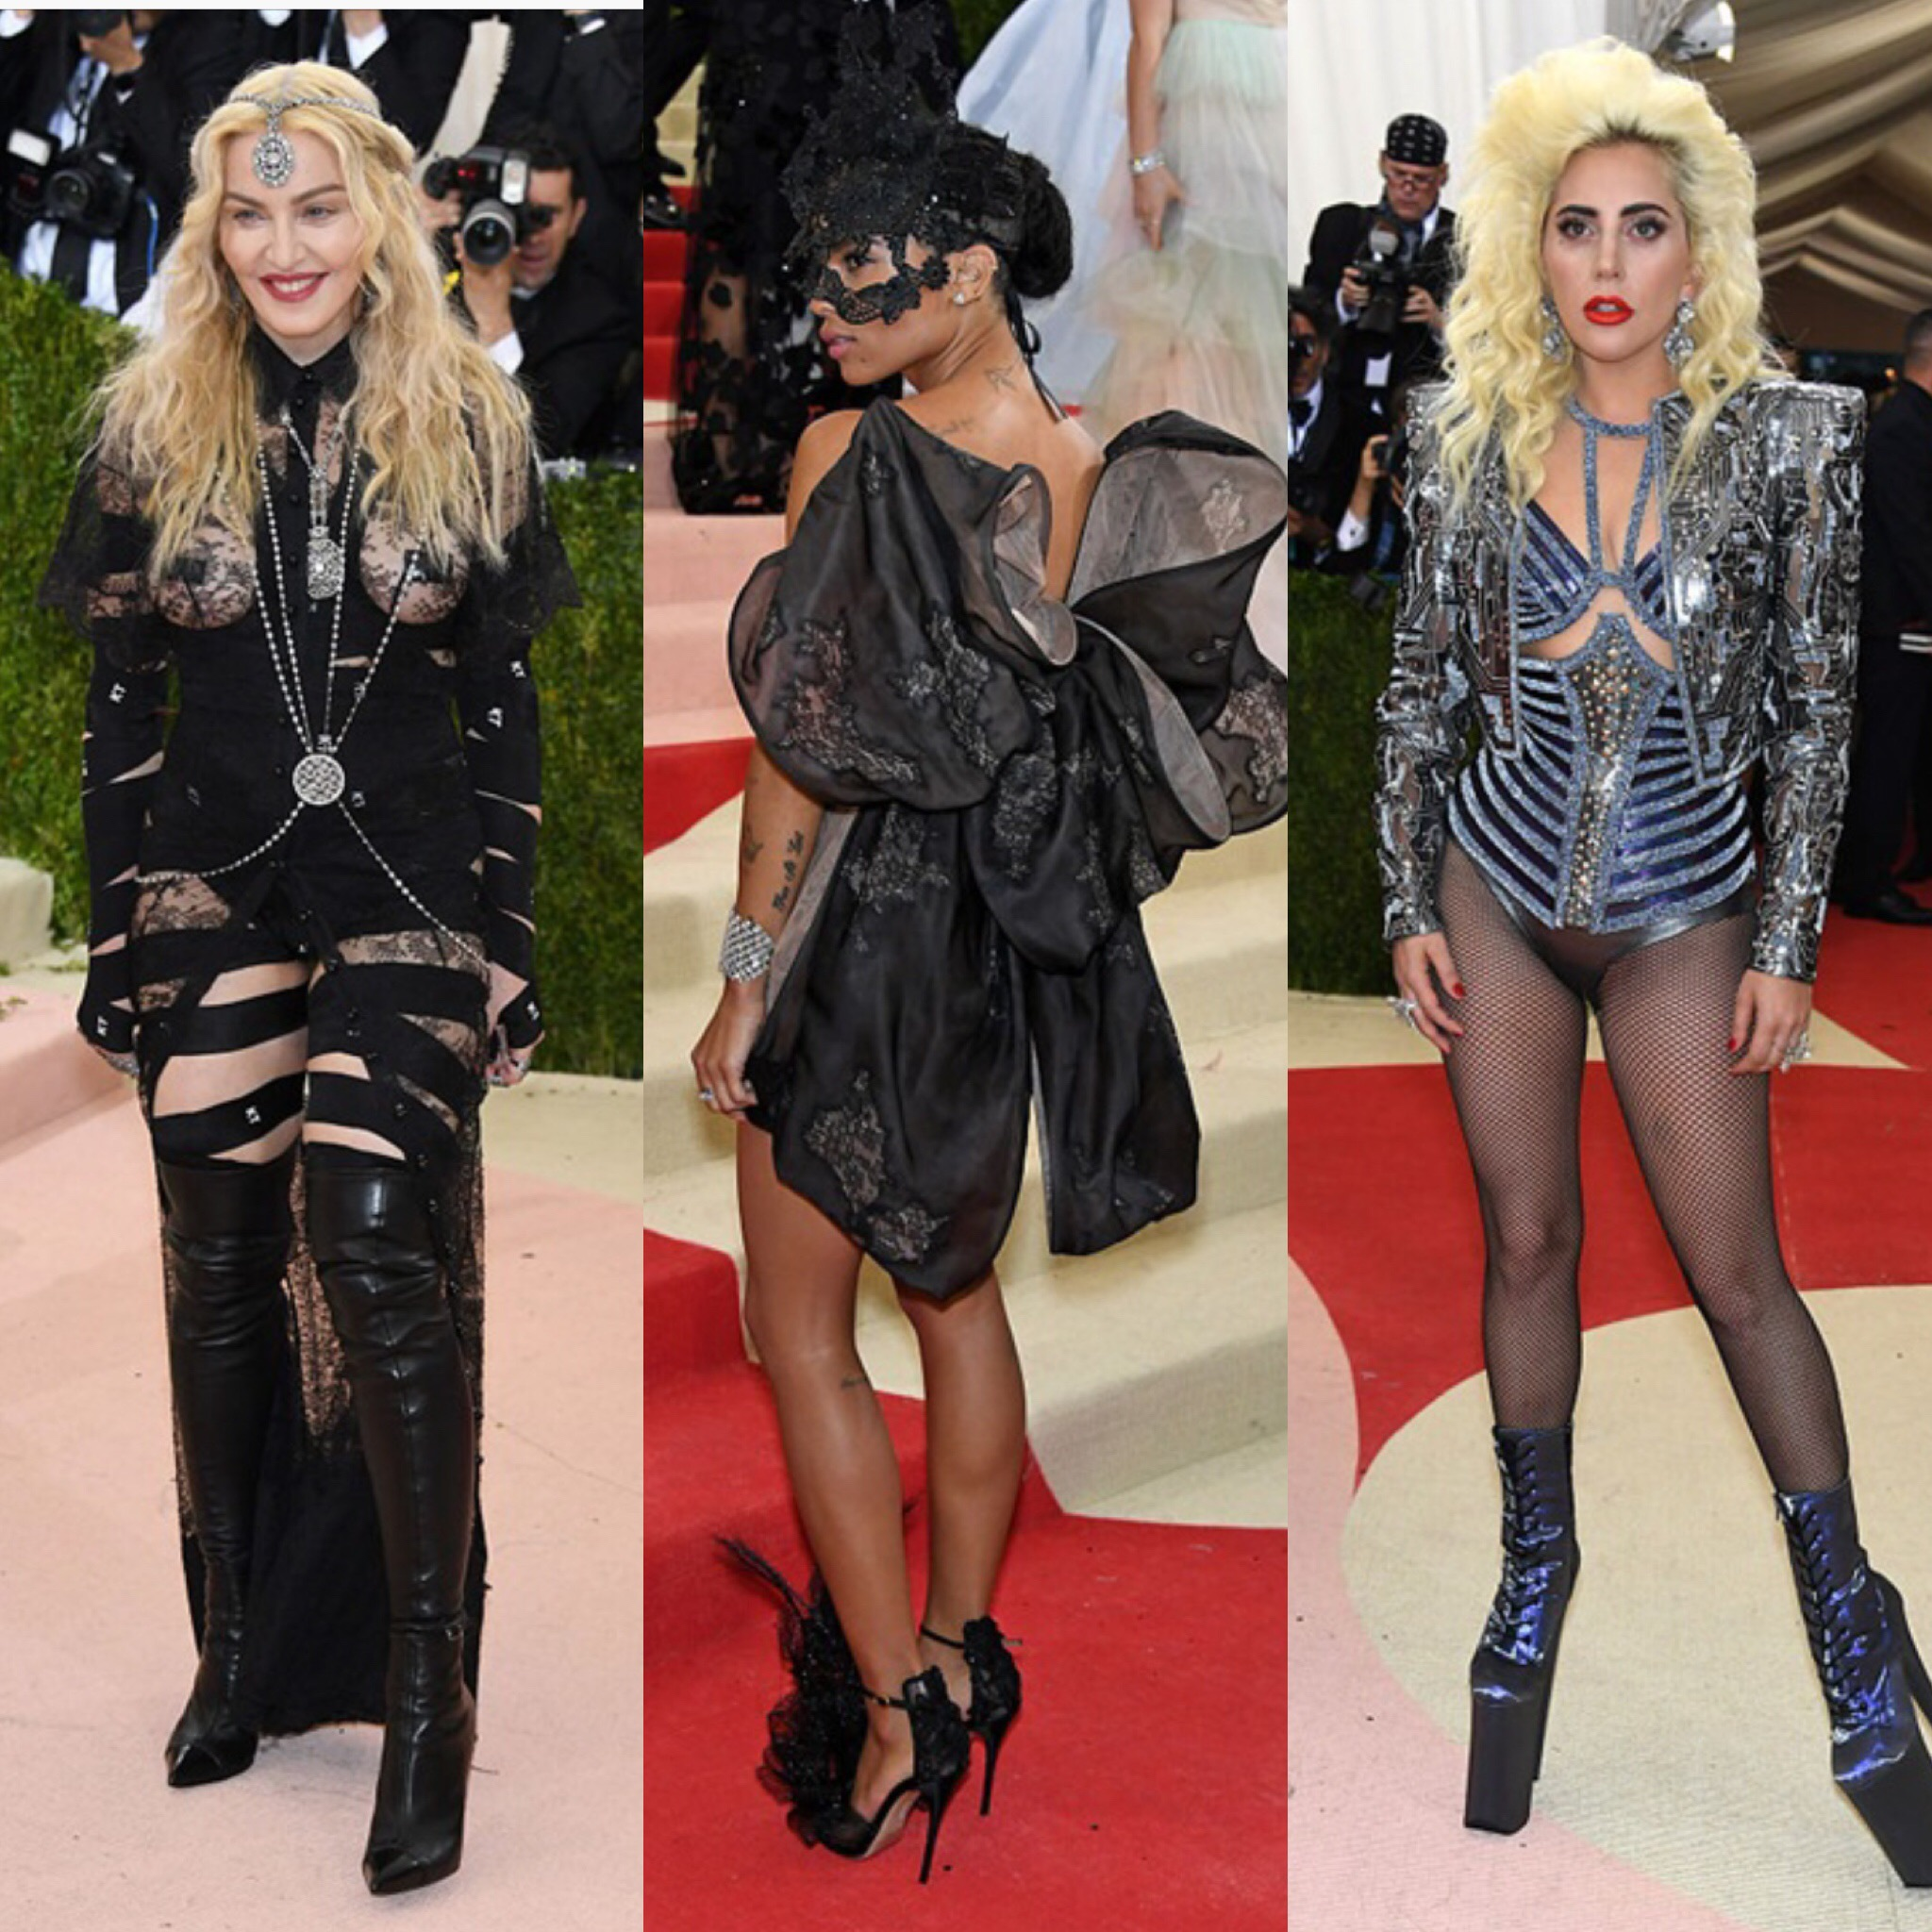 Trash look Madonna lady gaga met gala 2016